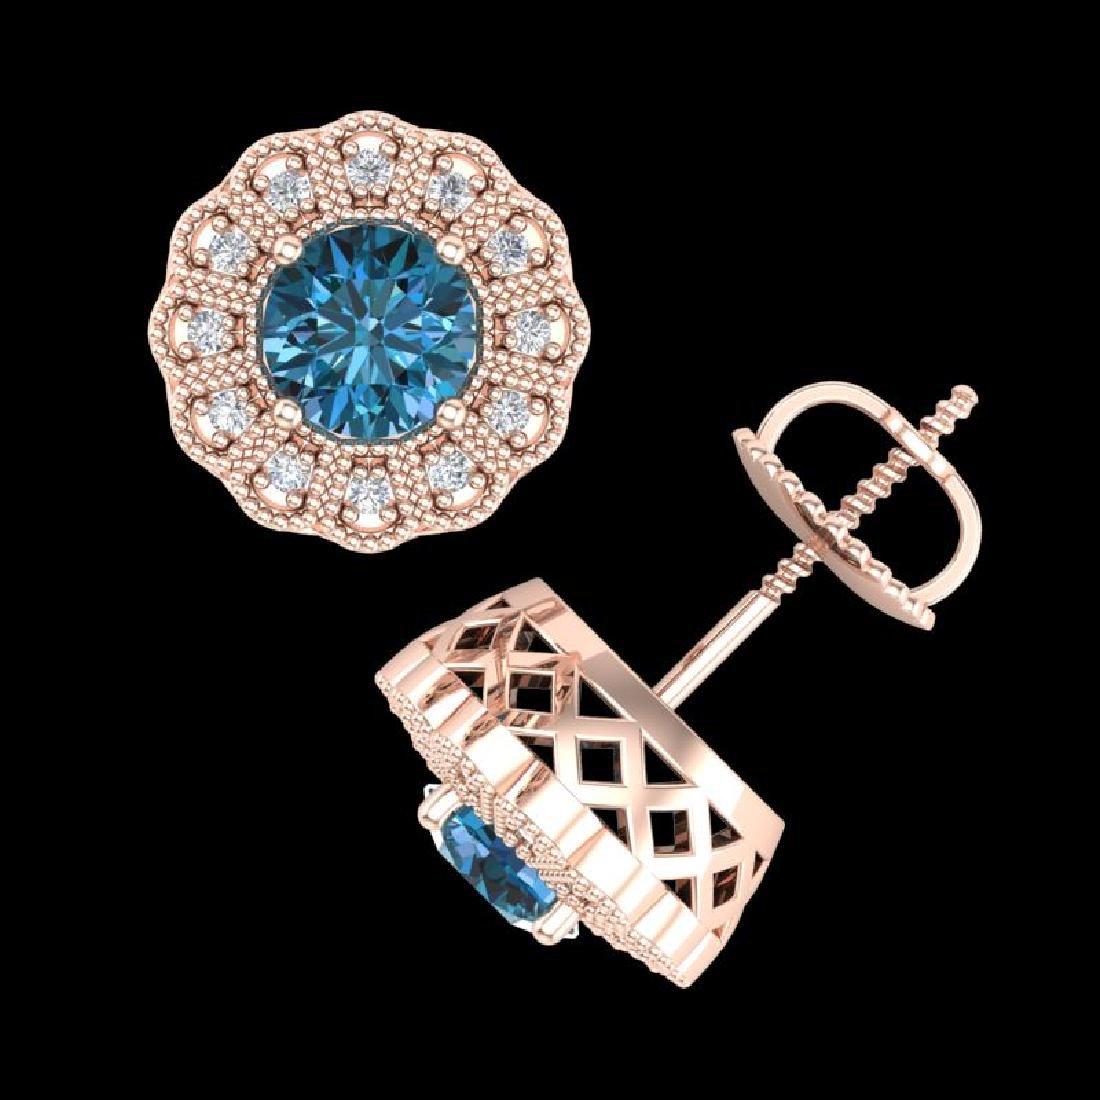 1.32 CTW Fancy Intense Blue Diamond Art Deco Stud - 3